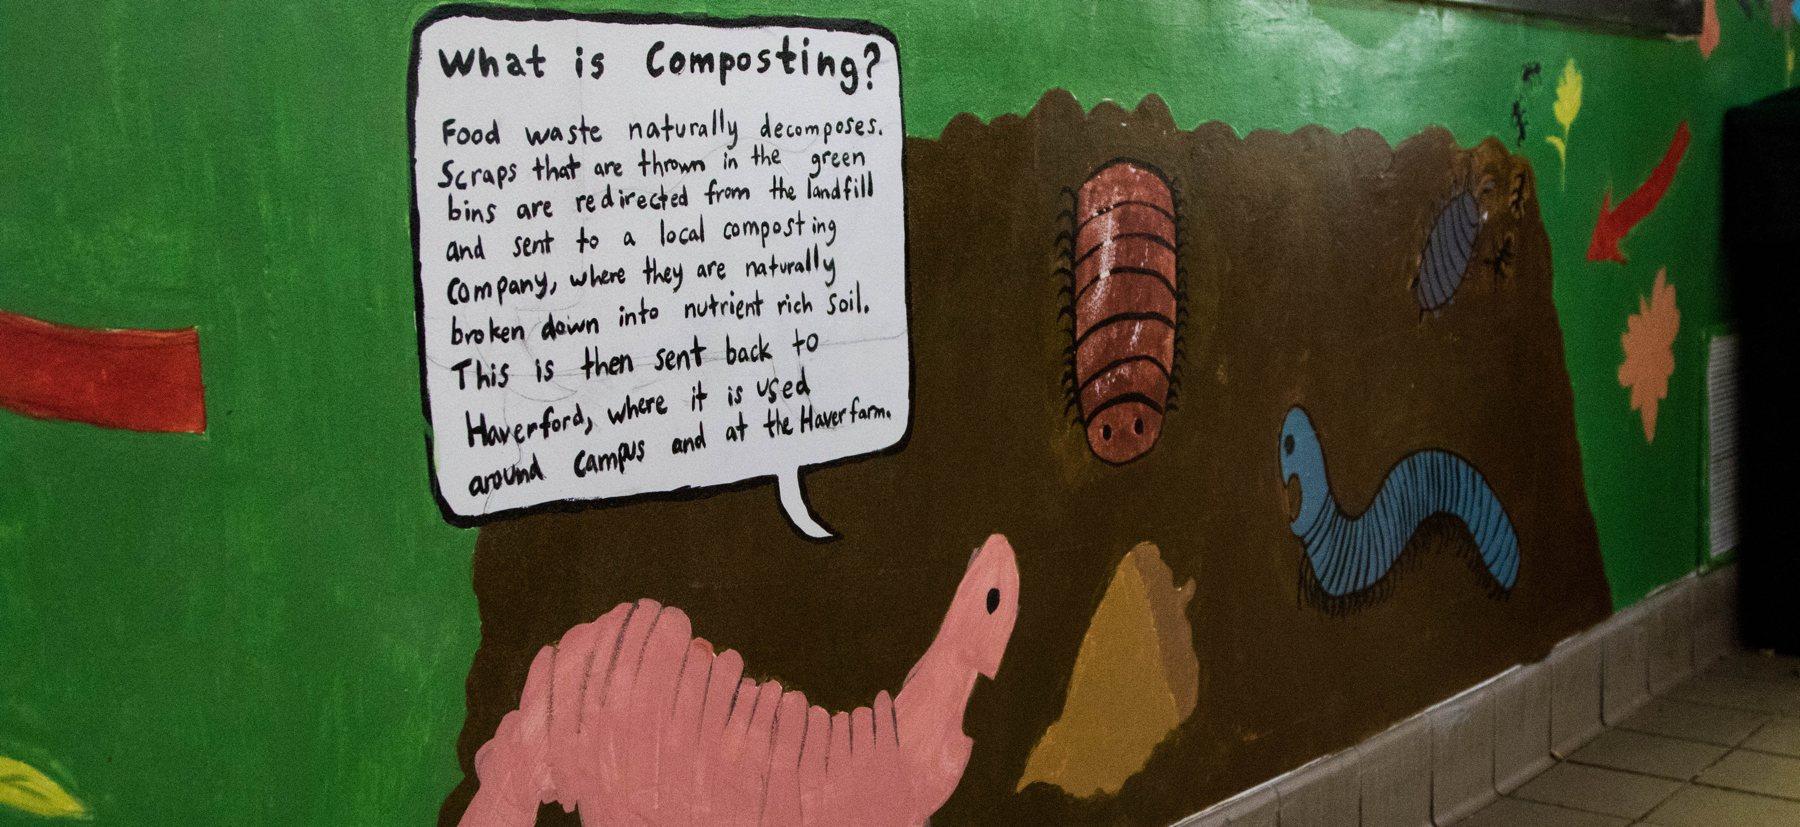 A cartoon worm painting describing composting to a cartoon bug and caterpillar.